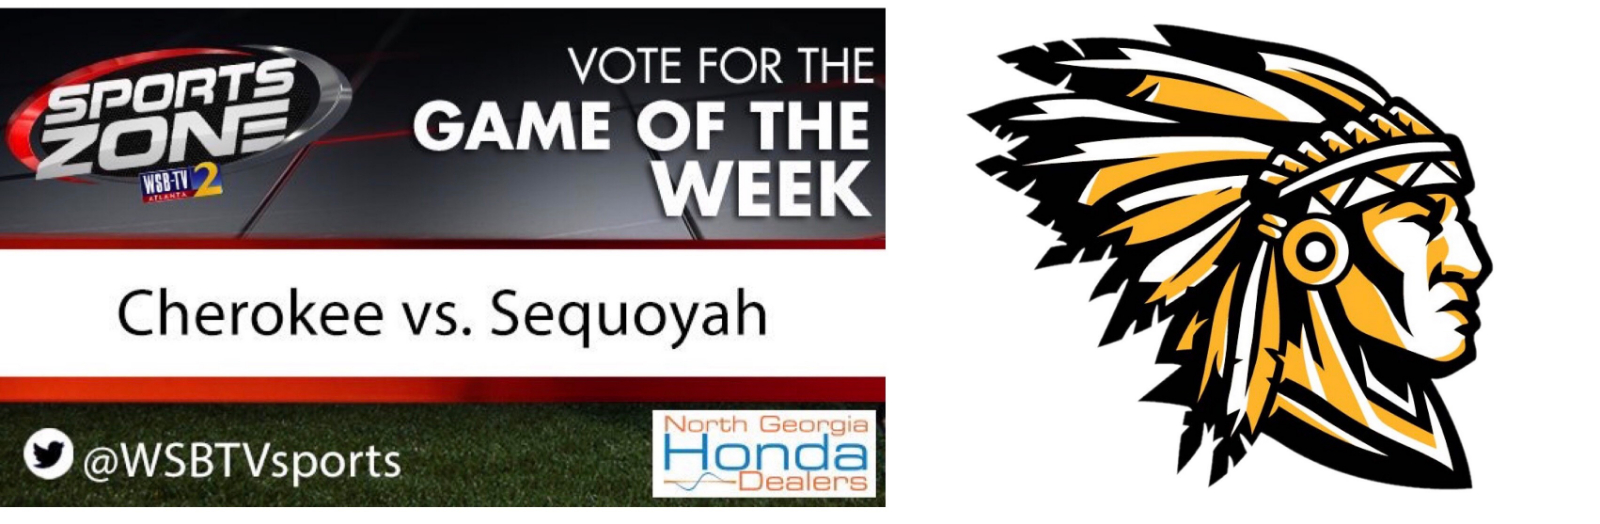 Sequoyah - Team Home Sequoyah Chiefs Sports